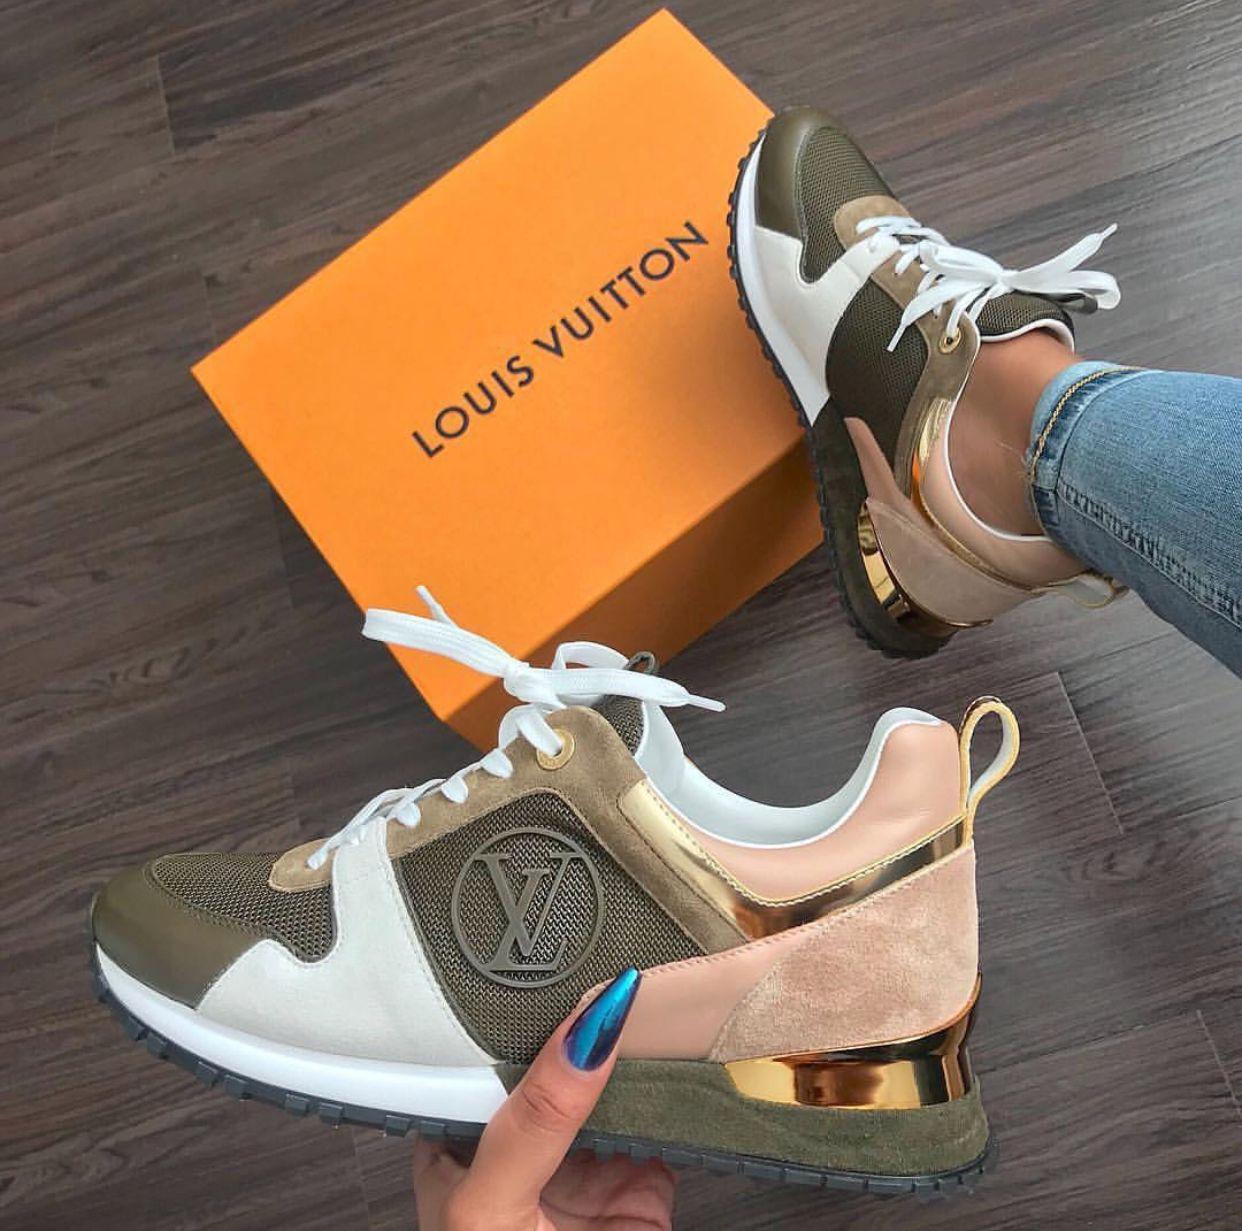 6135ce384c12 louis vuitton sneakers womens louis vuitton sneakers 2018 louis ...